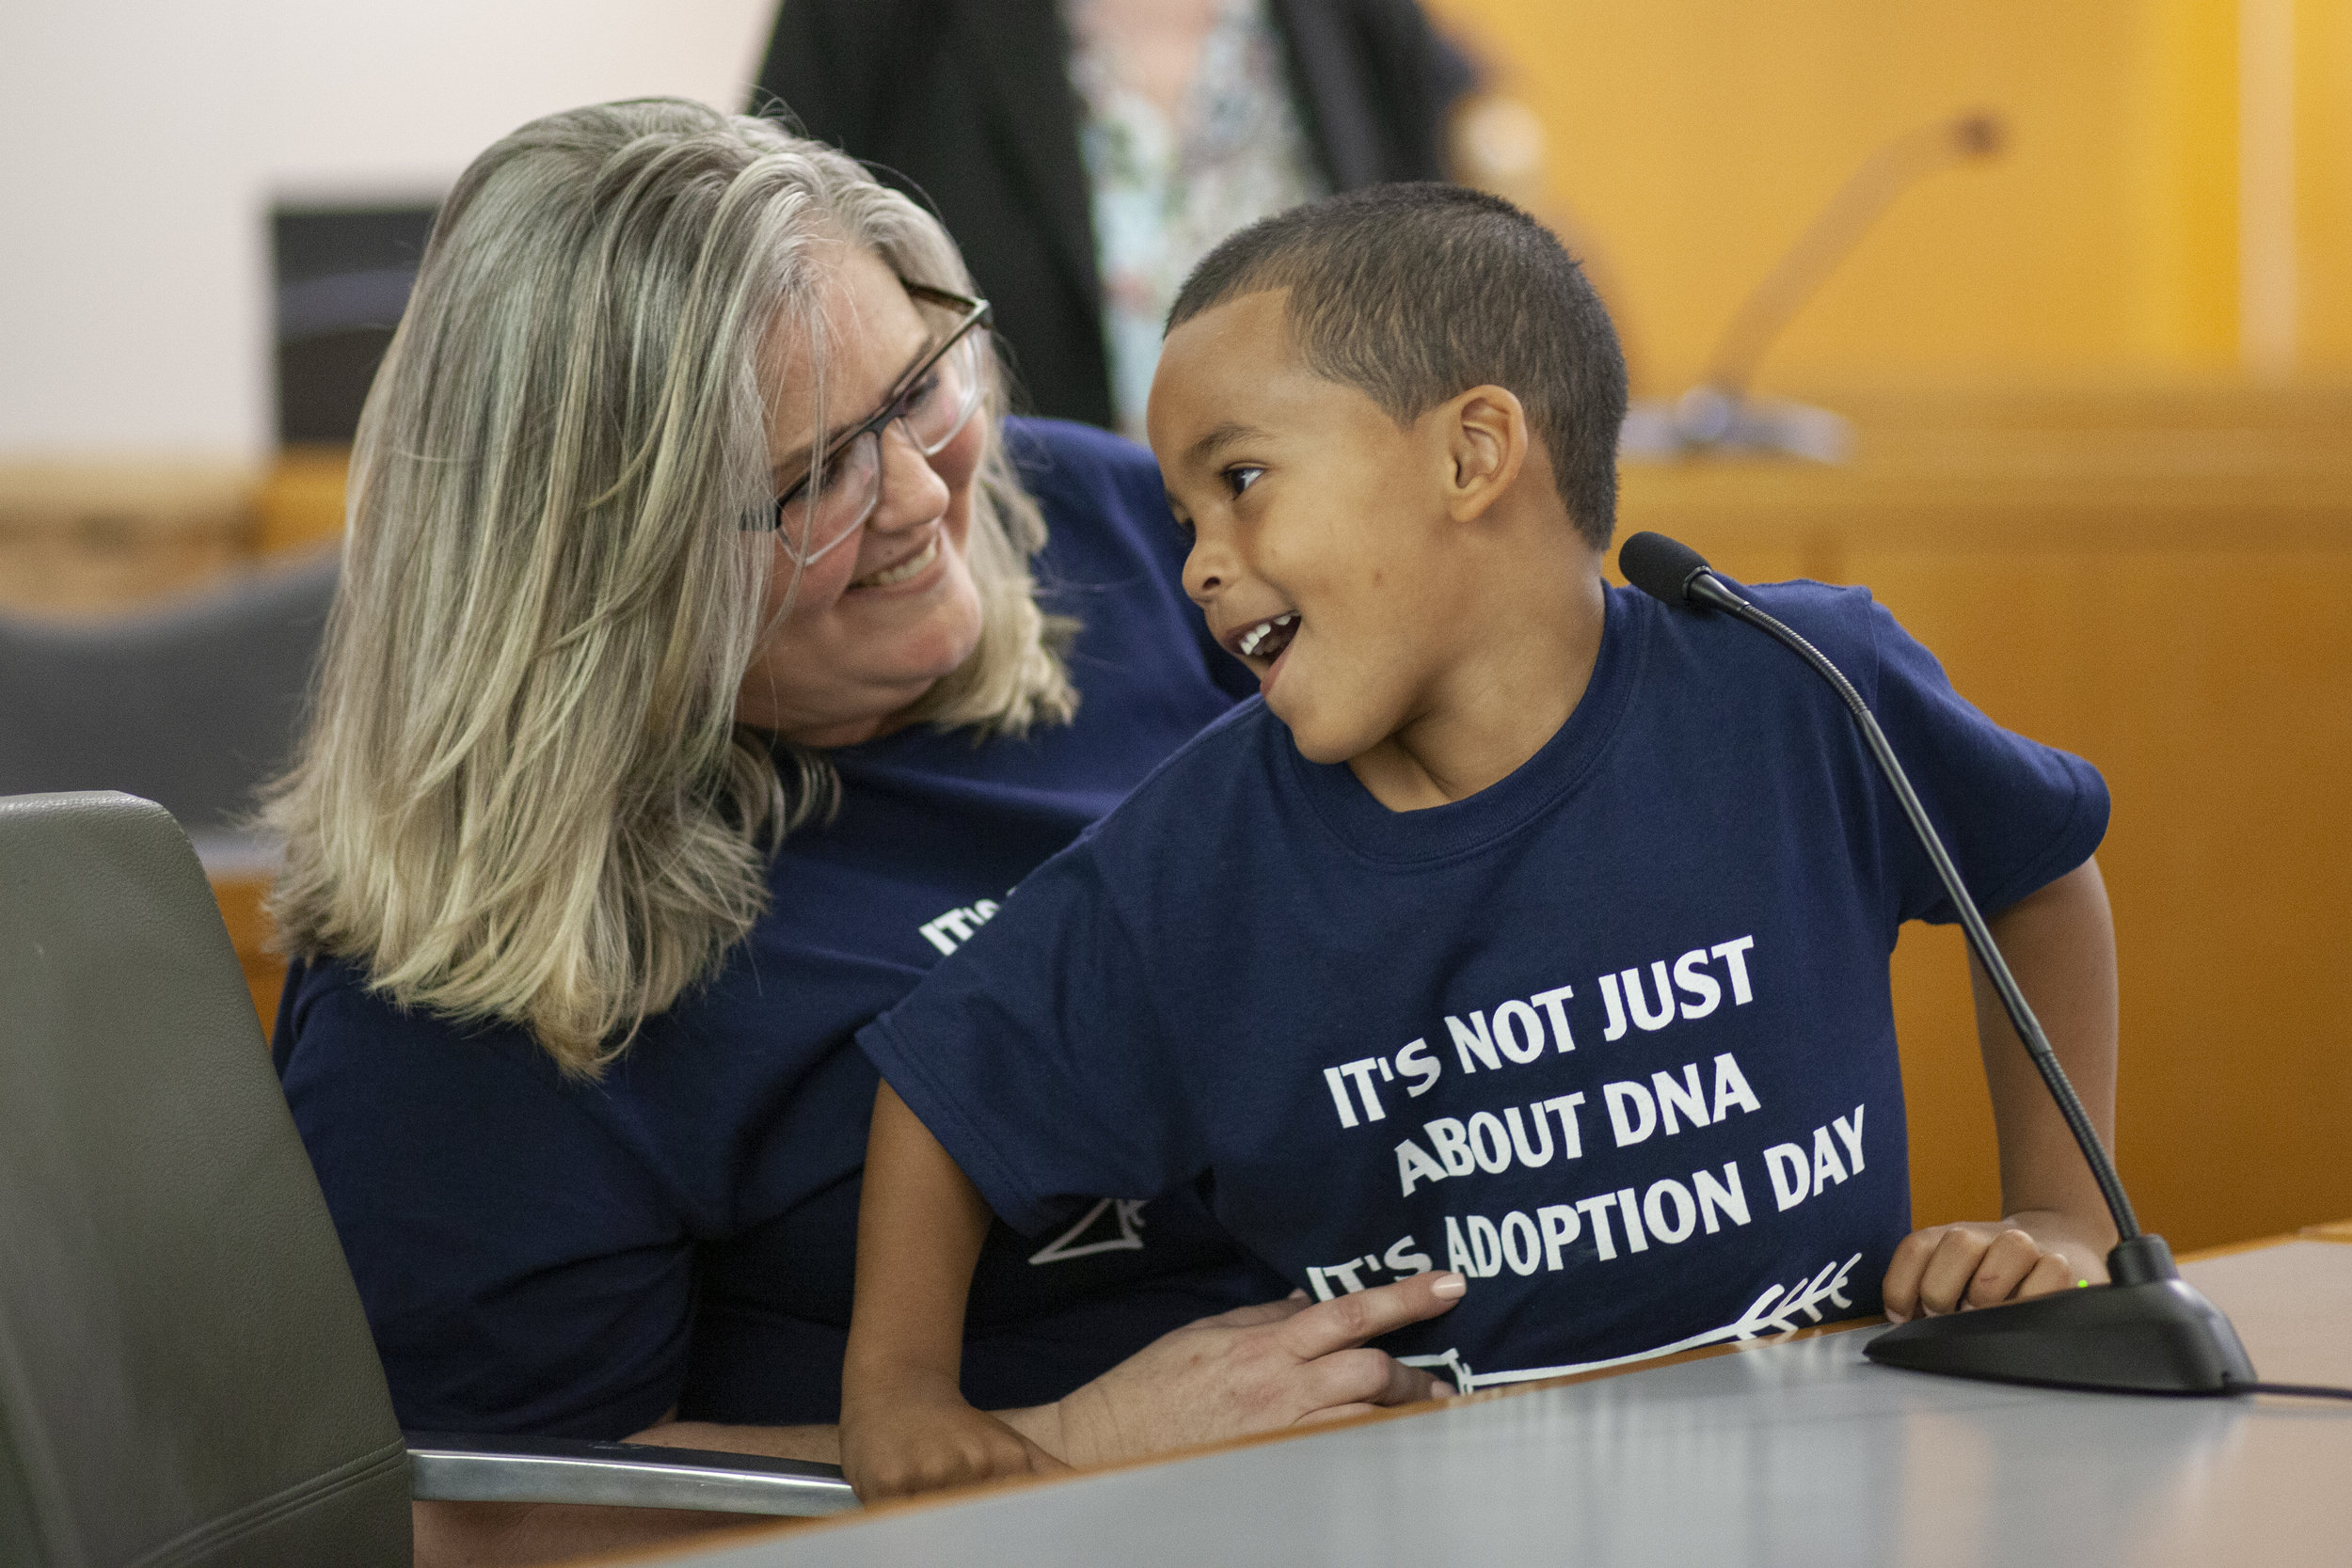 little-boy-adoption-day-miami-childrens-courthouse